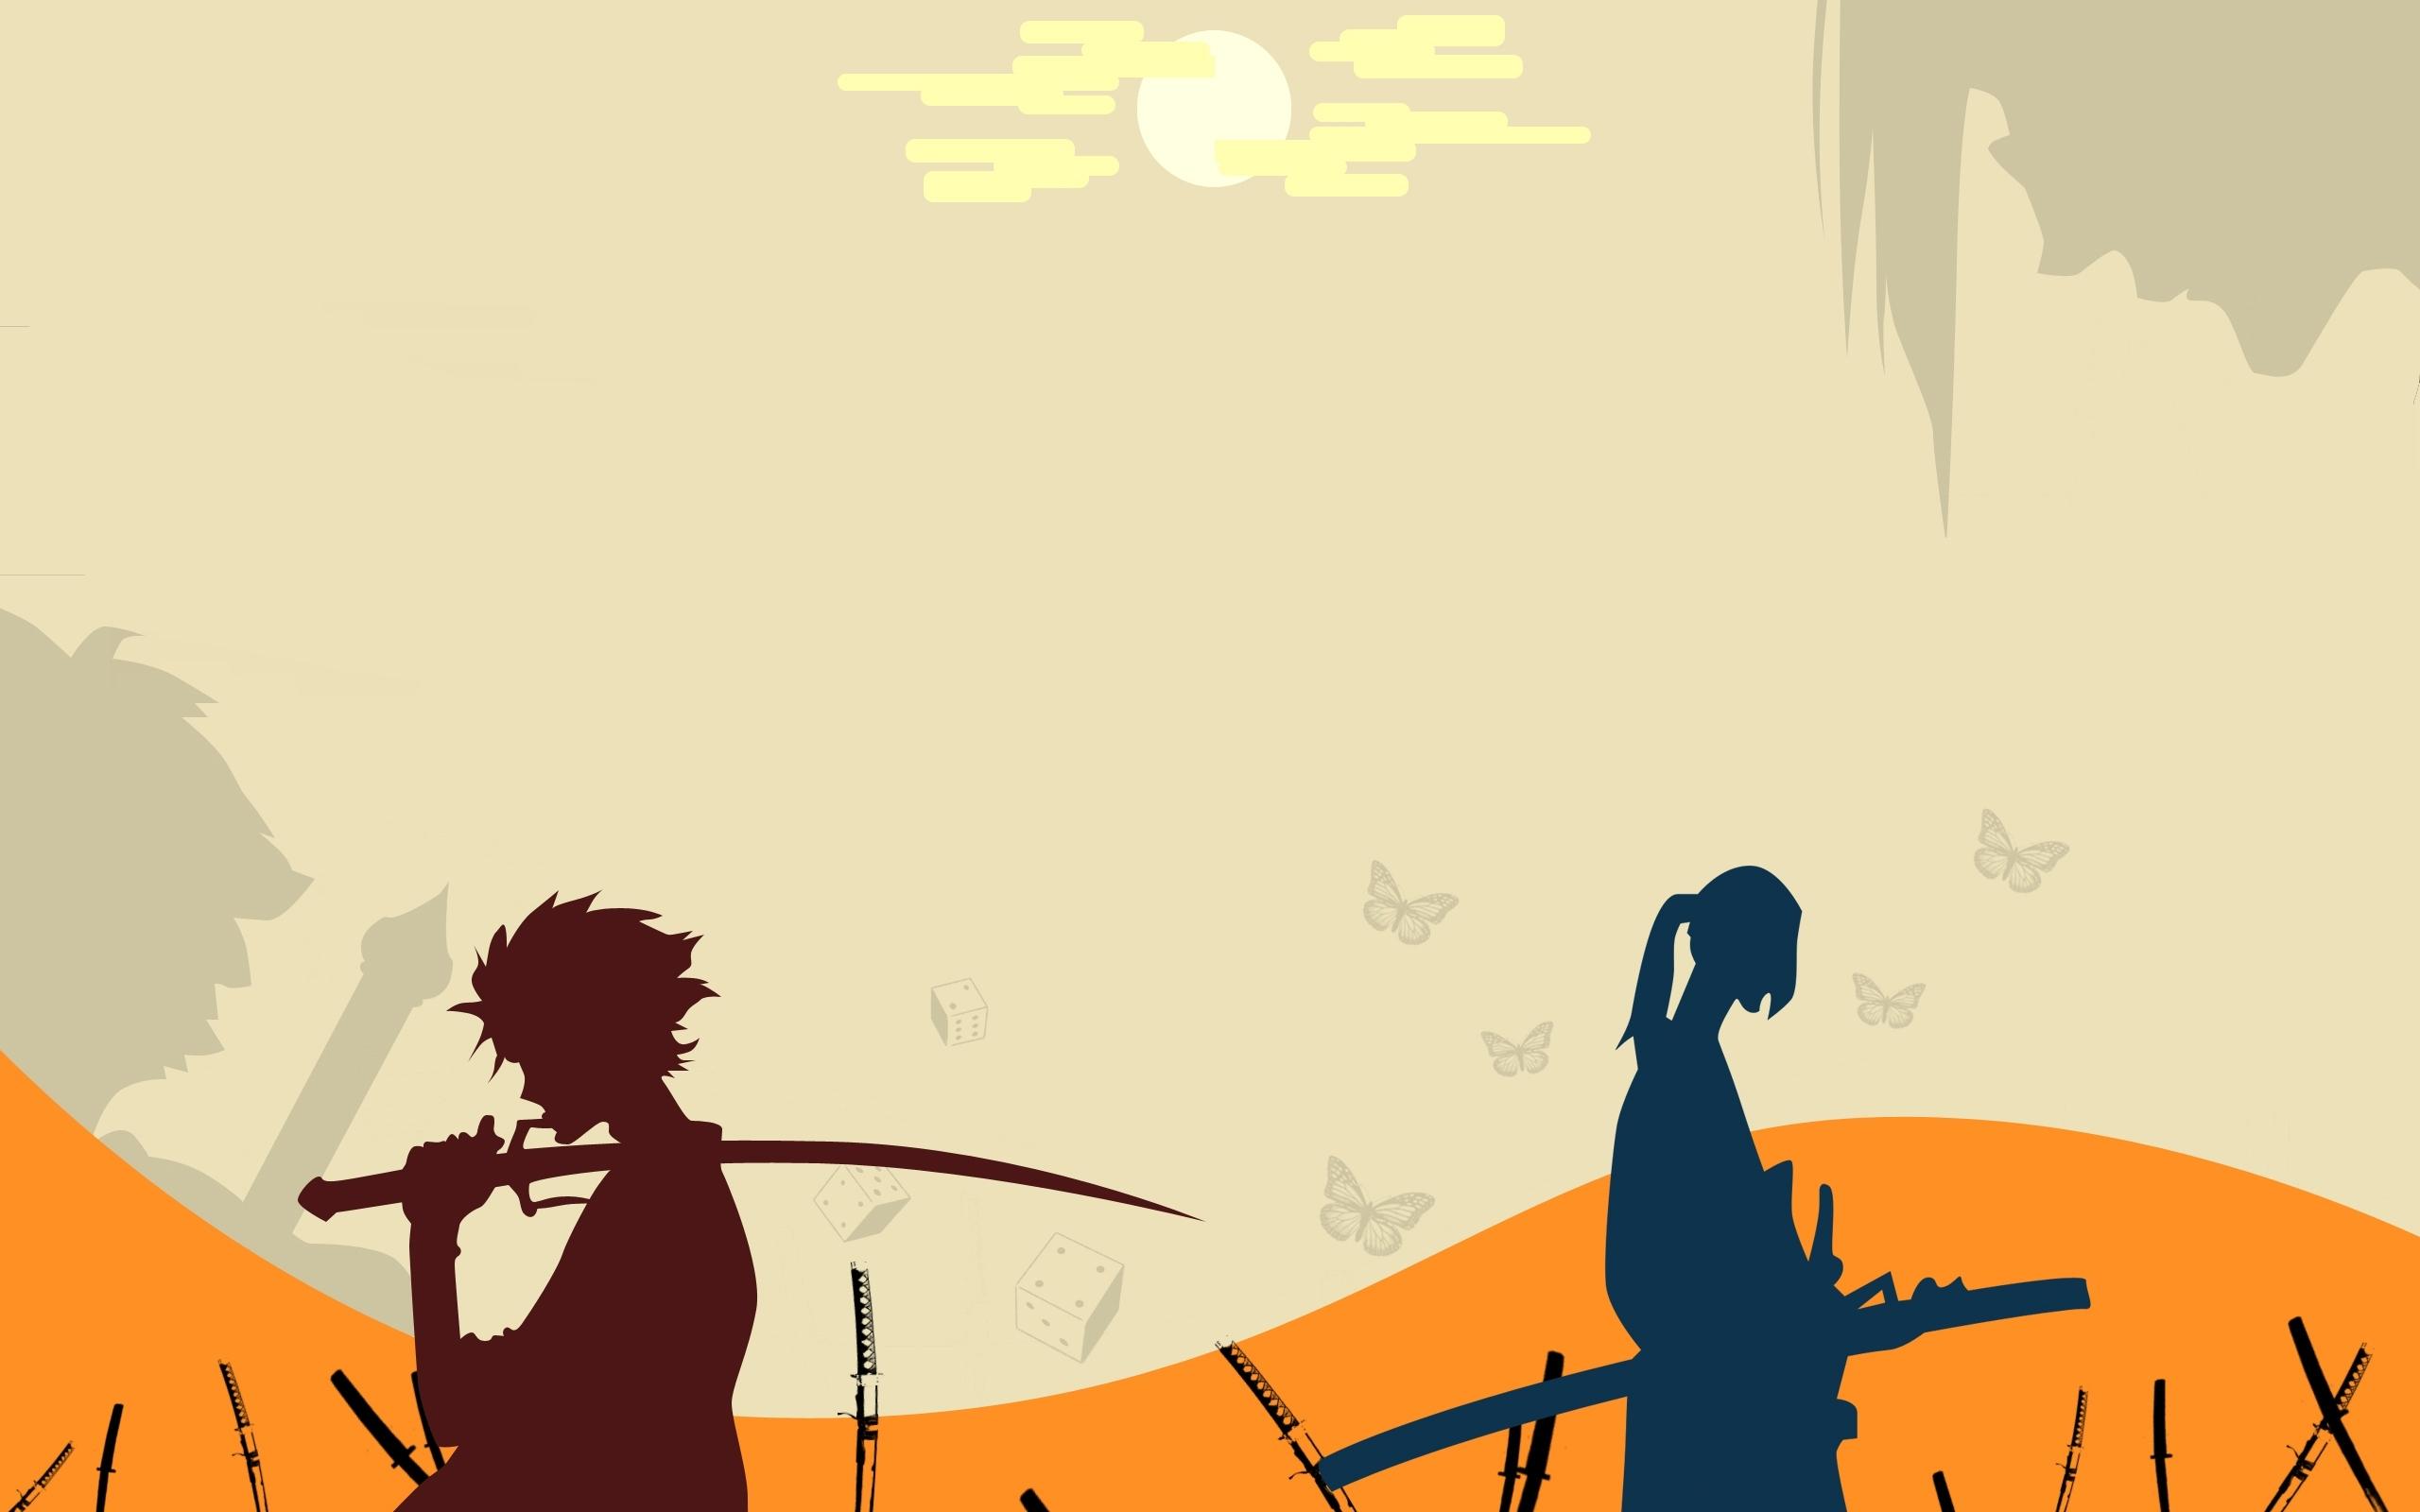 83 samurai champloo hd wallpapers | background images - wallpaper